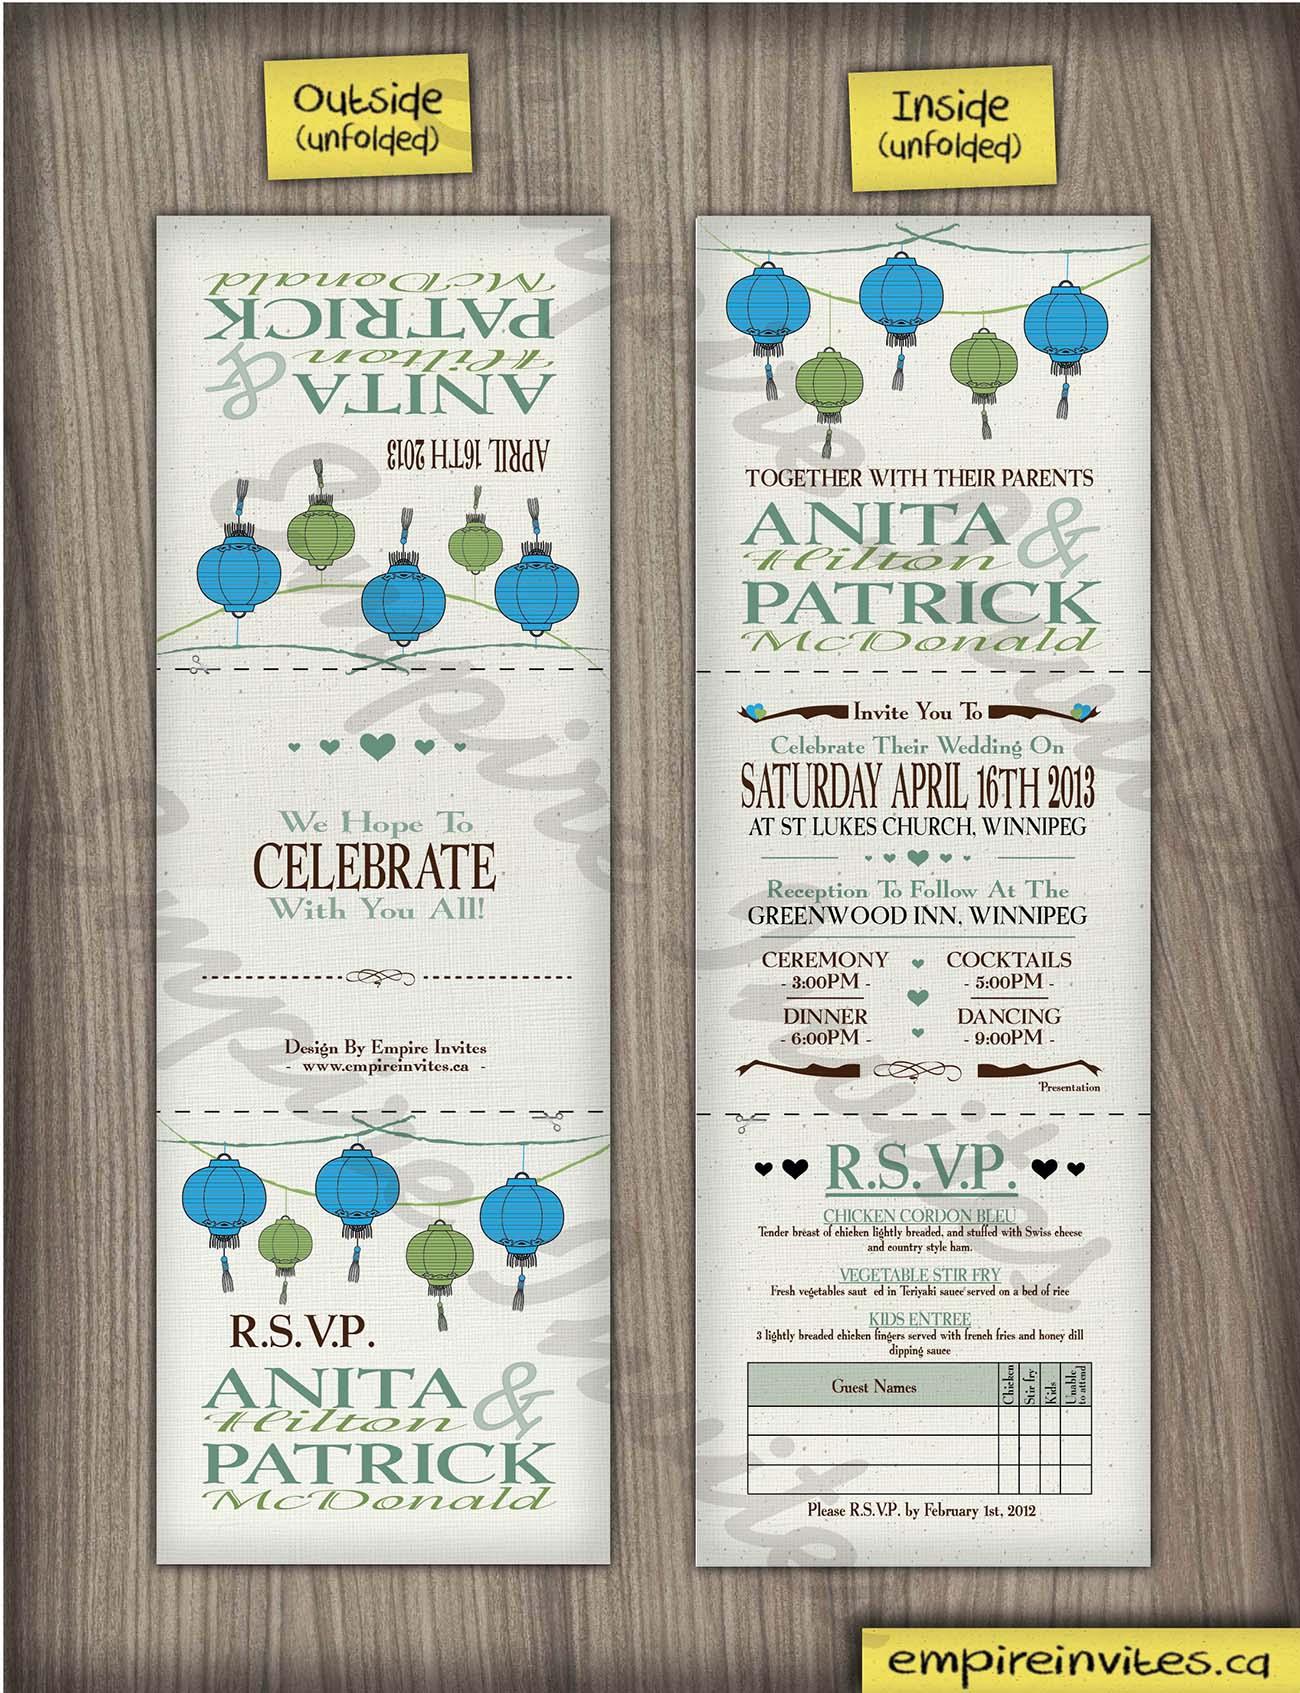 Custom Chinese lantern wedding invitations Canada | Empire Invites